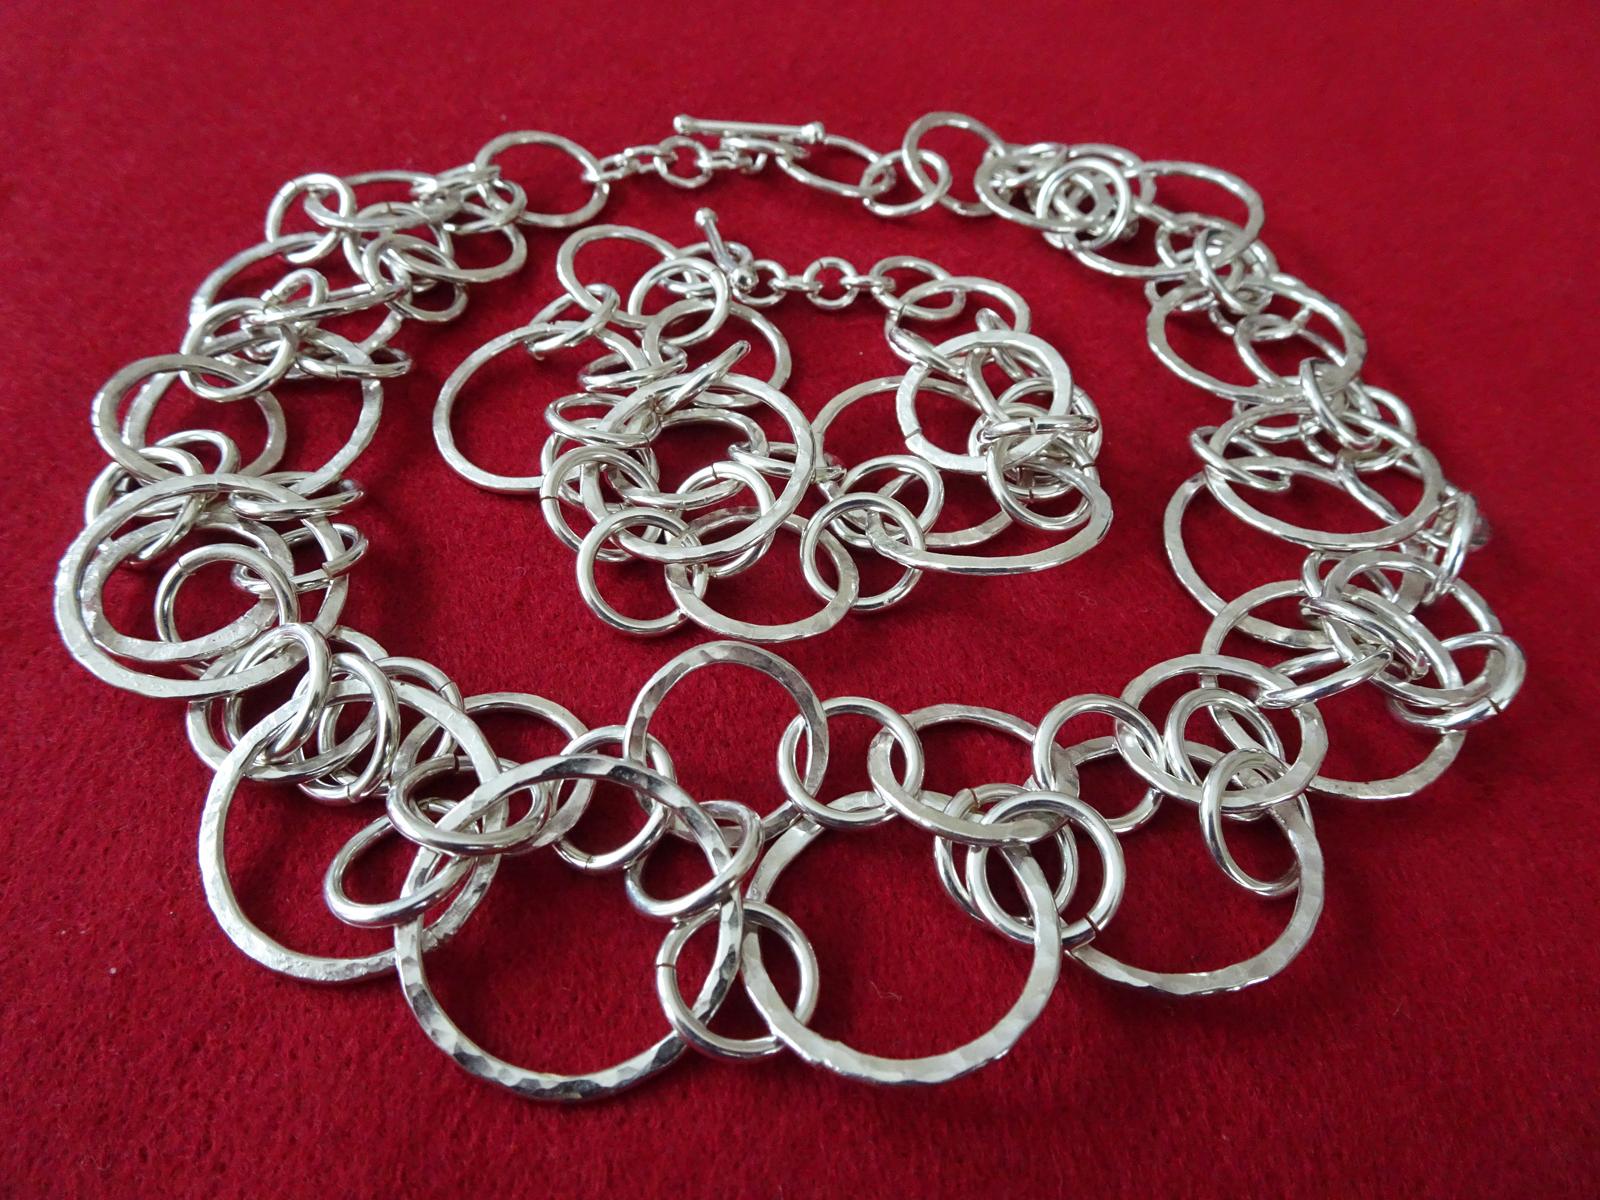 Tangled Circles 2010  Necklace & Bracelet  Sterling Silver